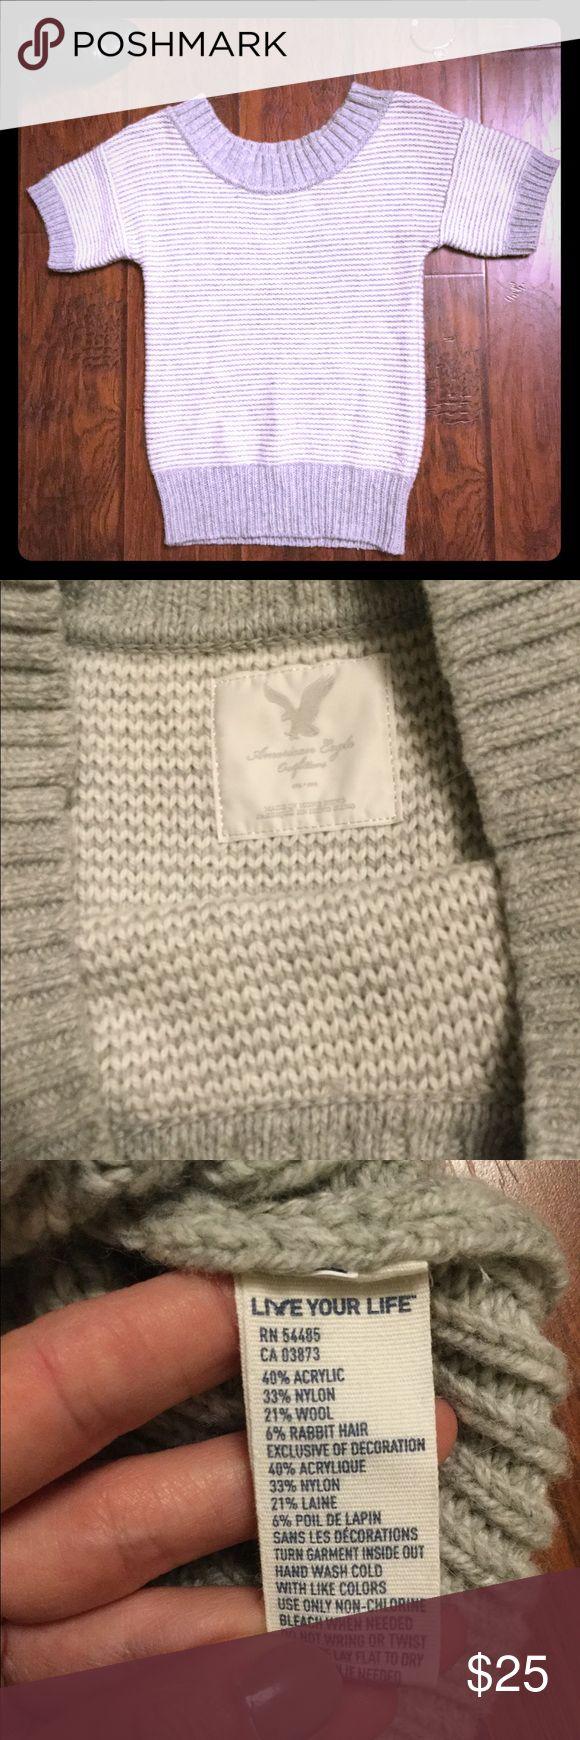 American Eagle Sweater American Eagle gray/white striped sweater. Short sleeved size Medium acrylic, nylon, wool, and rabbit fur blend make it soft and warm. American Eagle Outfitters Sweaters Crew & Scoop Necks